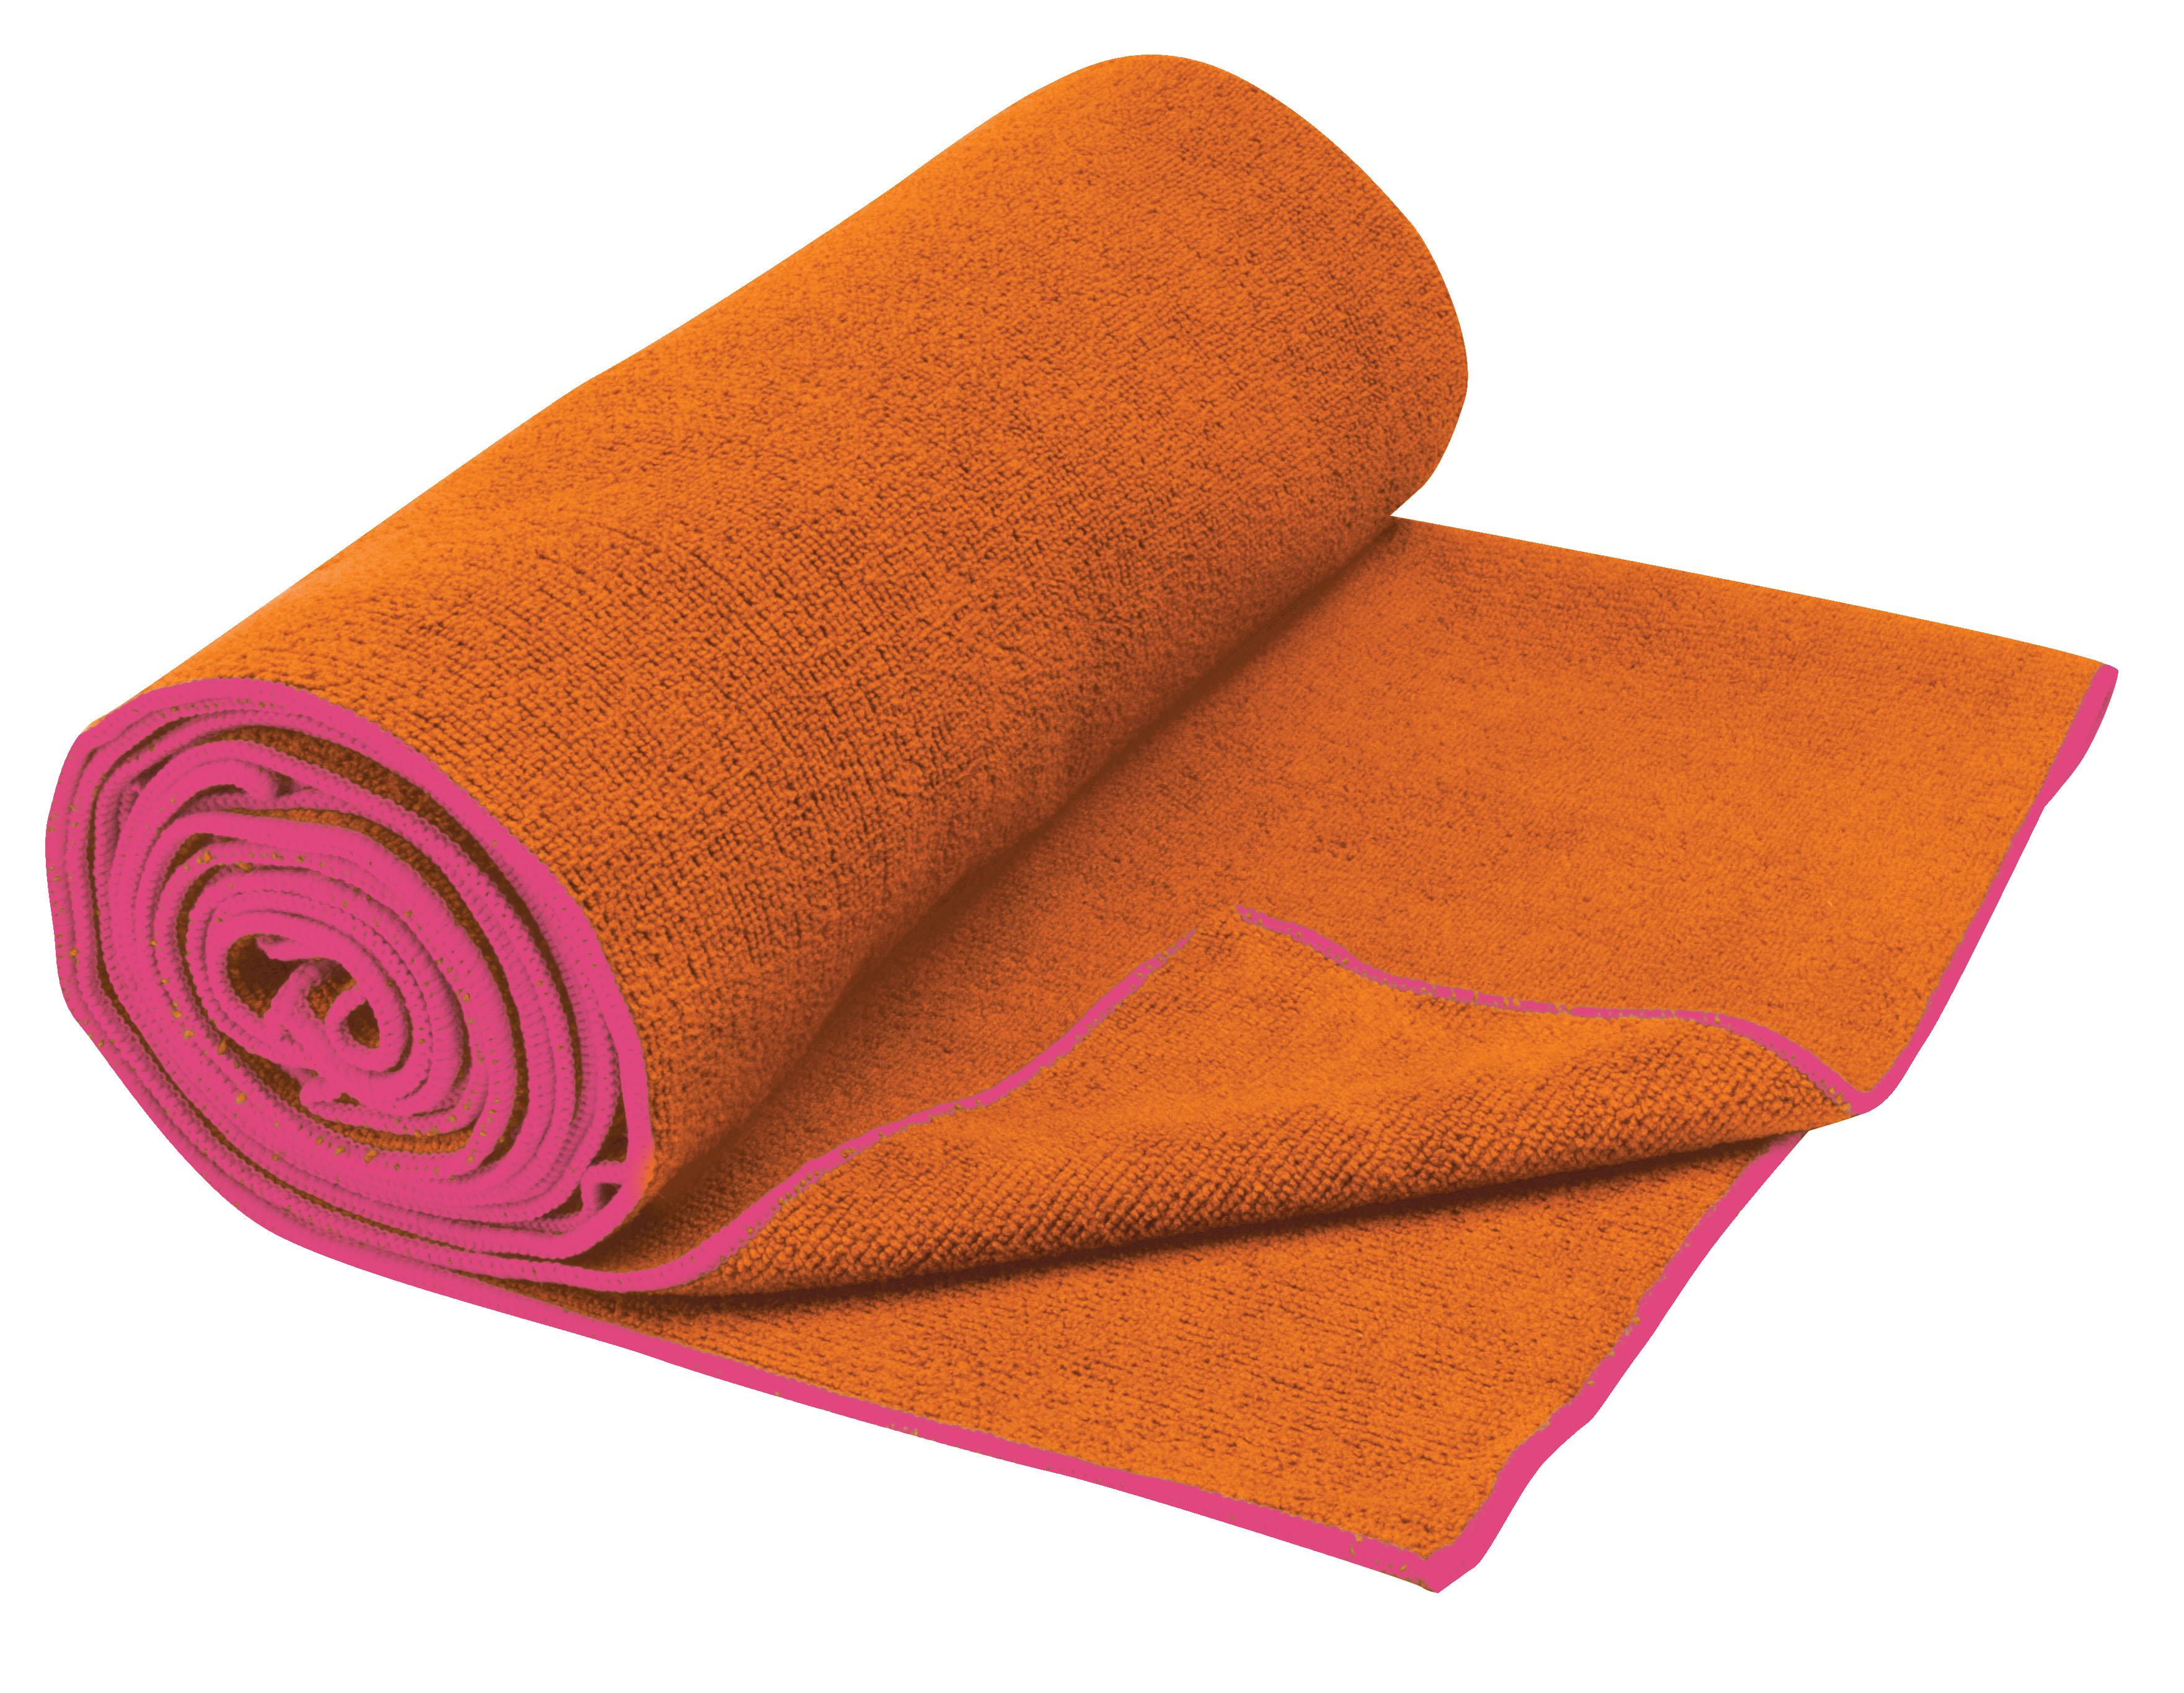 mat towel hot img product yoga mats emerald towels grip byc